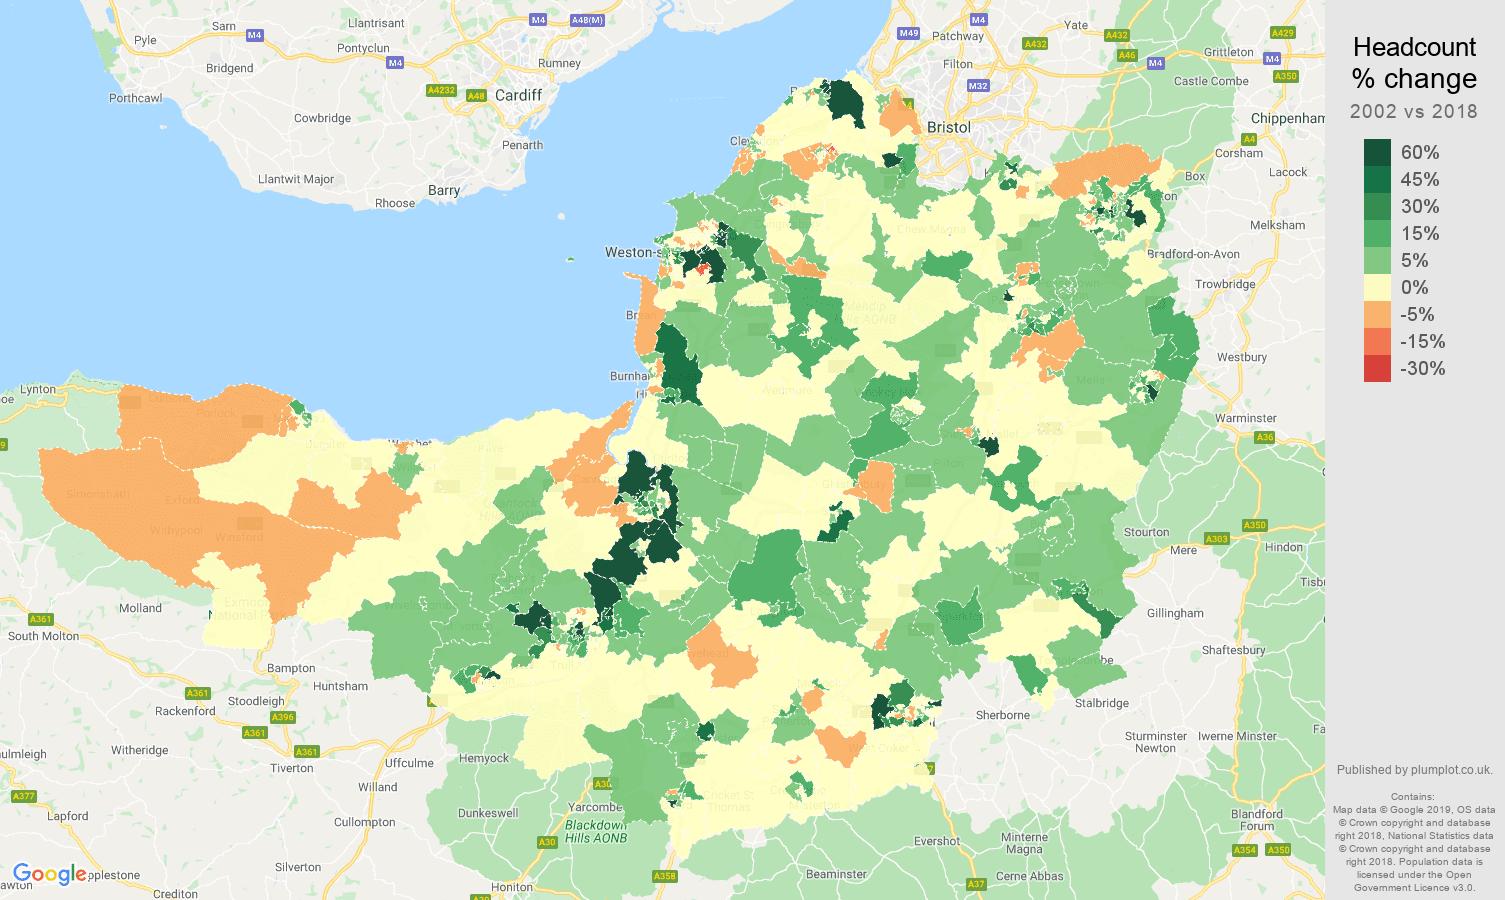 Somerset headcount change map